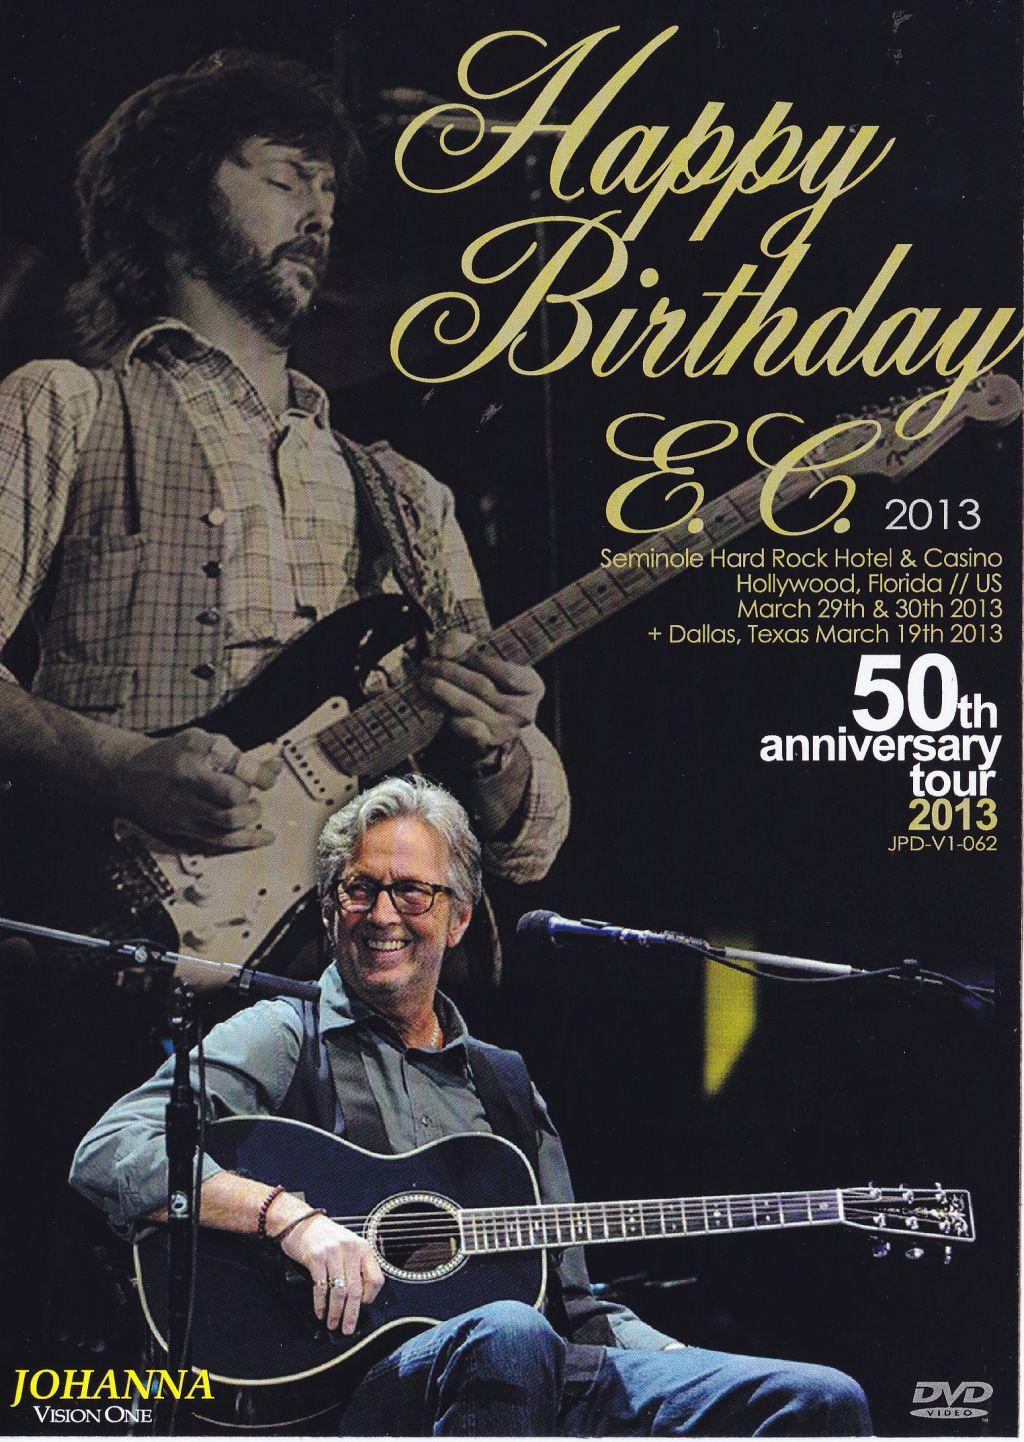 eric clapton birthday Eric Clapton / Happy Birthday EC 2013 / 1DVDR – GiGinJapan eric clapton birthday